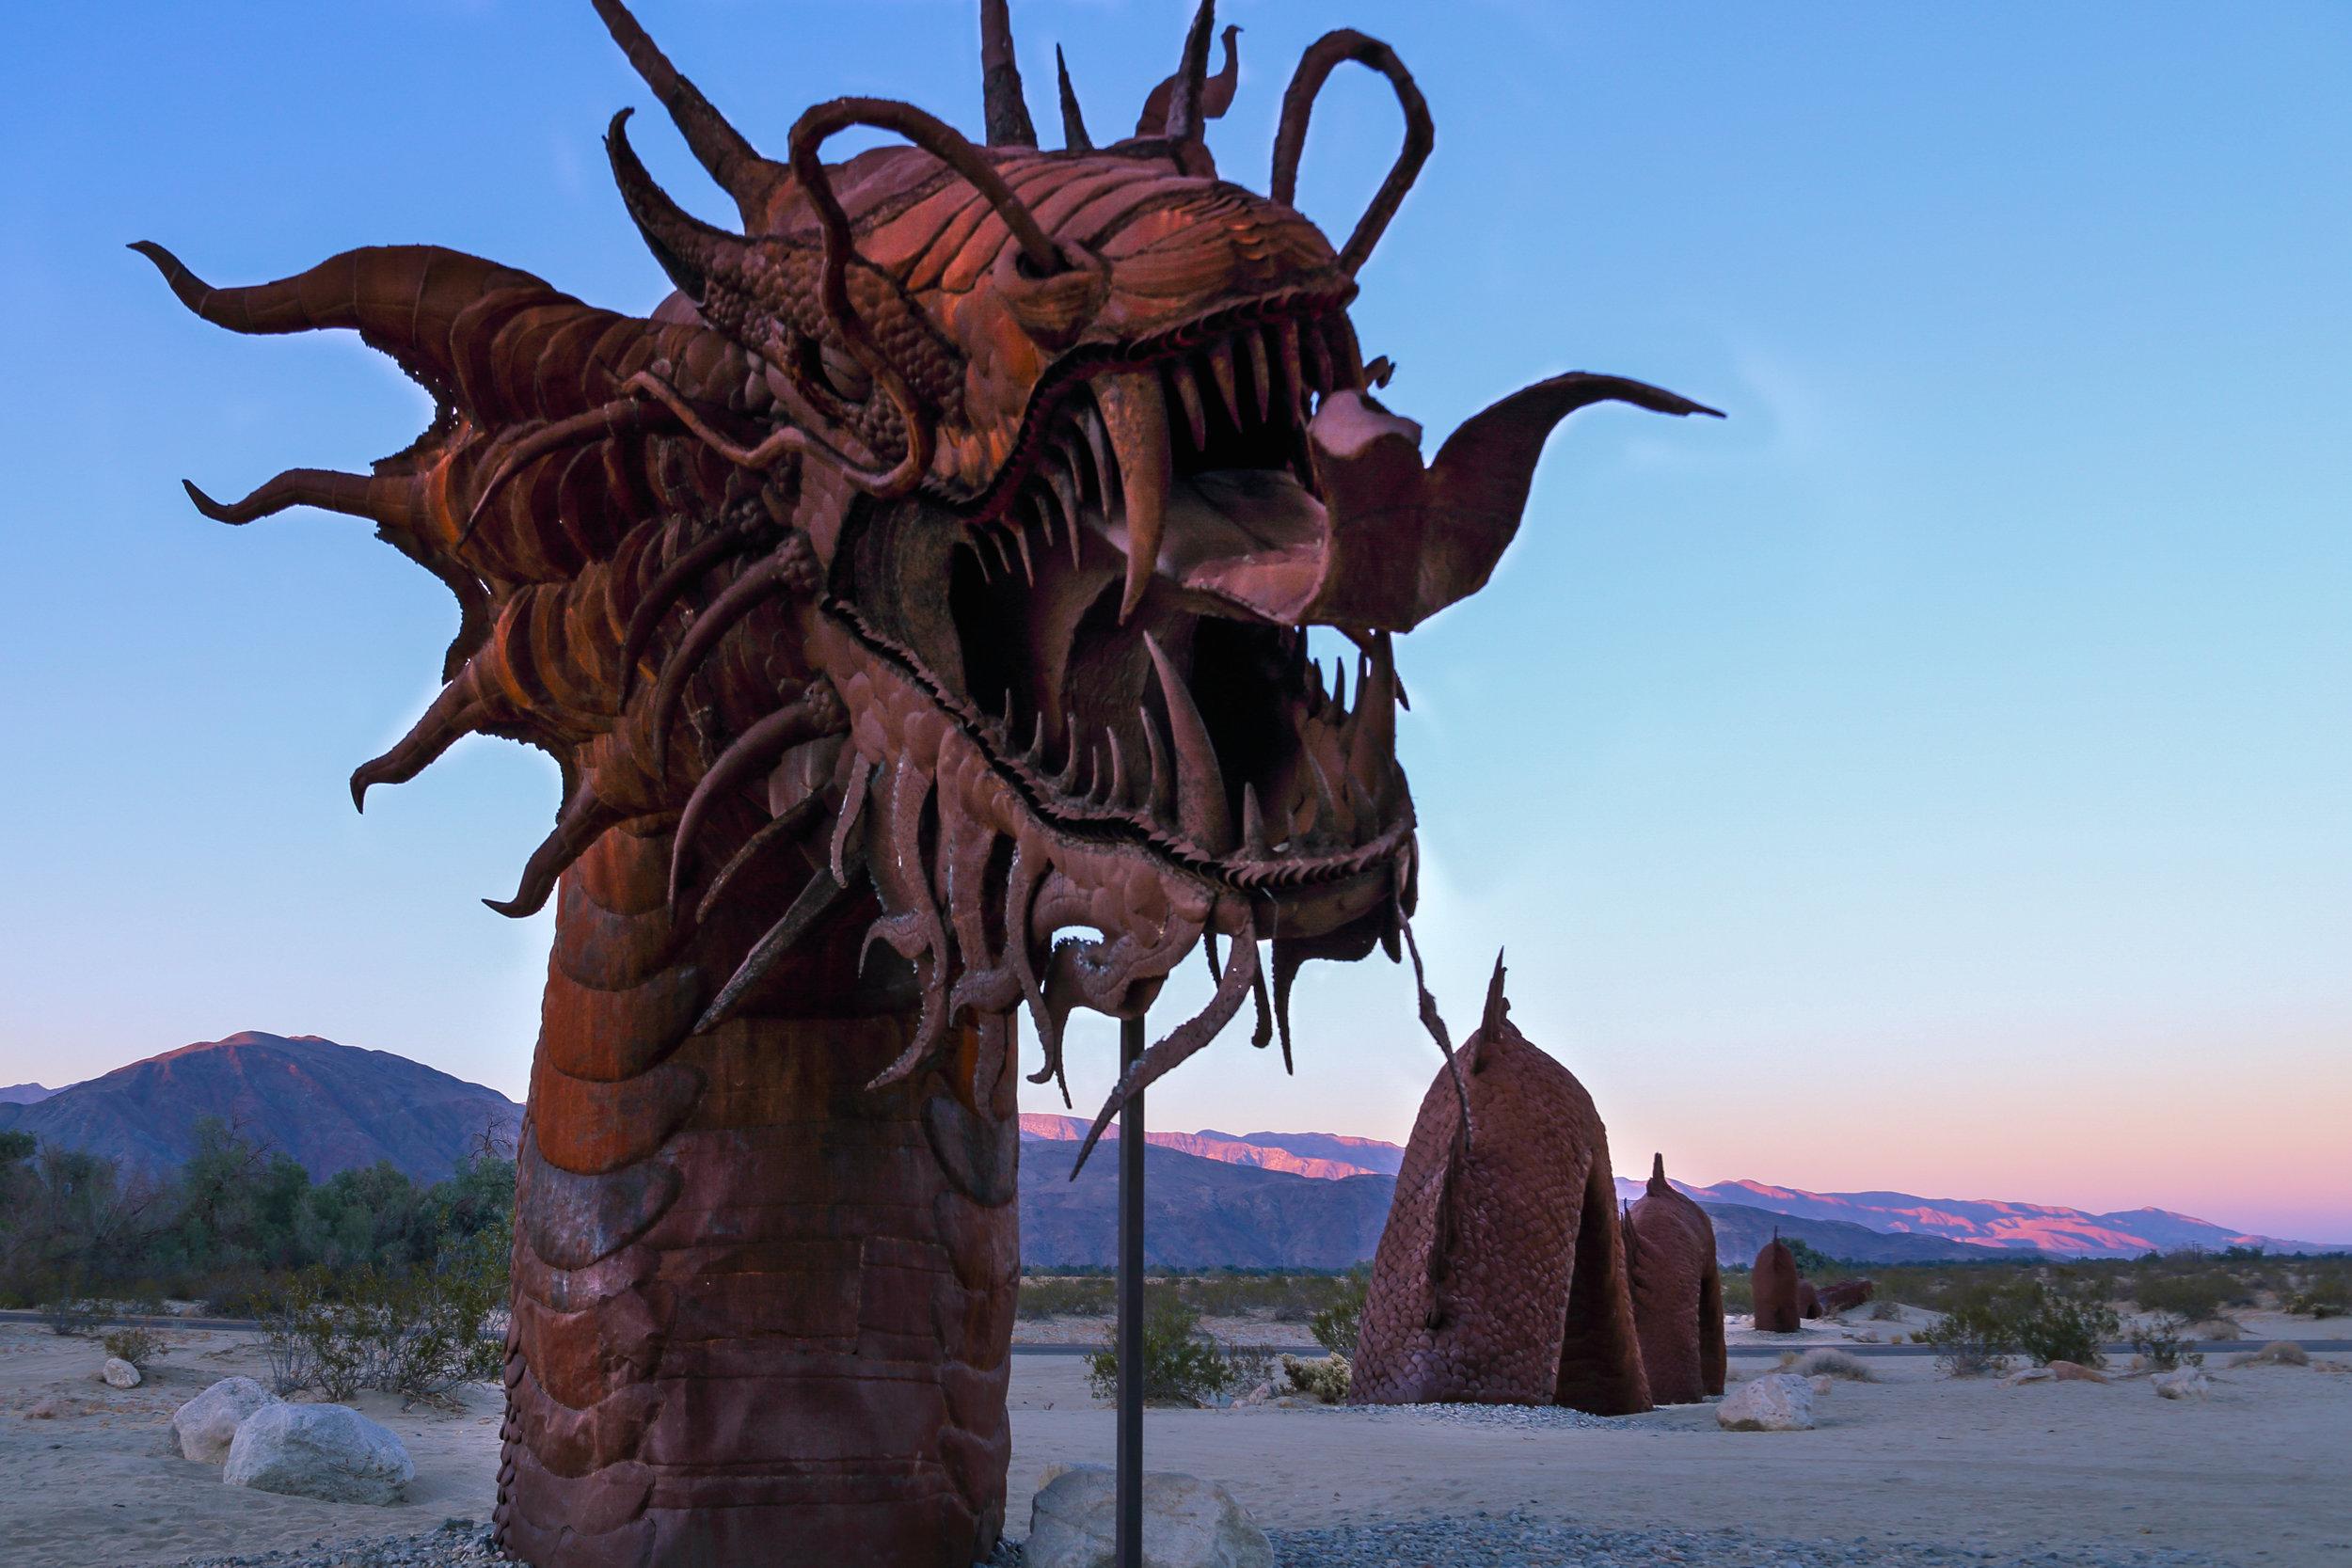 A metal dragon-headed serpent sculpture encountered in Borrego Springs. Art by Ricardo Breceda.